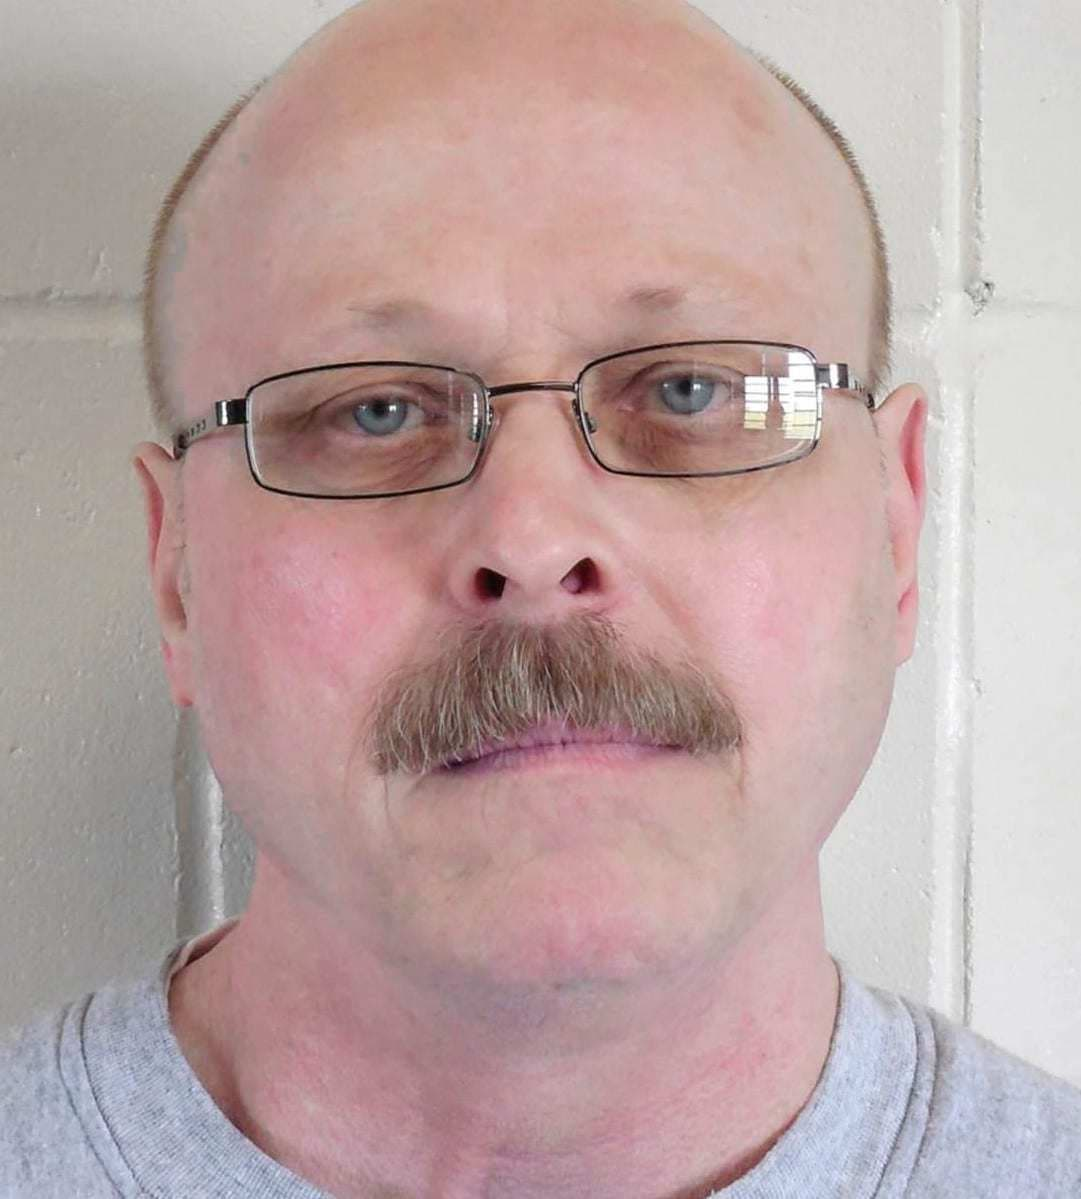 Nebraska Bill to Make Executions More Transparent Advances in Legislature